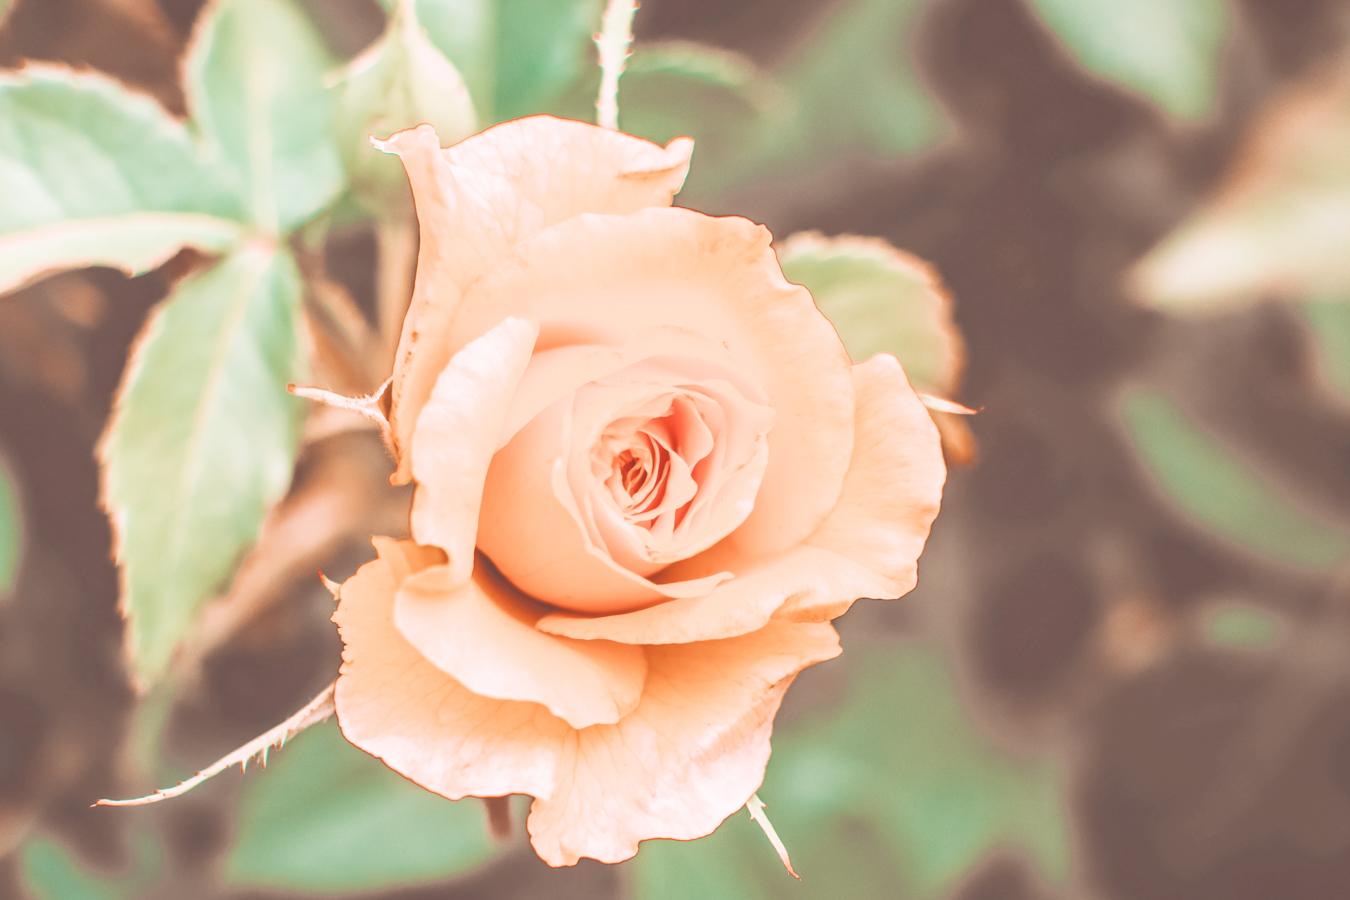 Instagrammable rose at the Kelleher Rose Garden in Boston